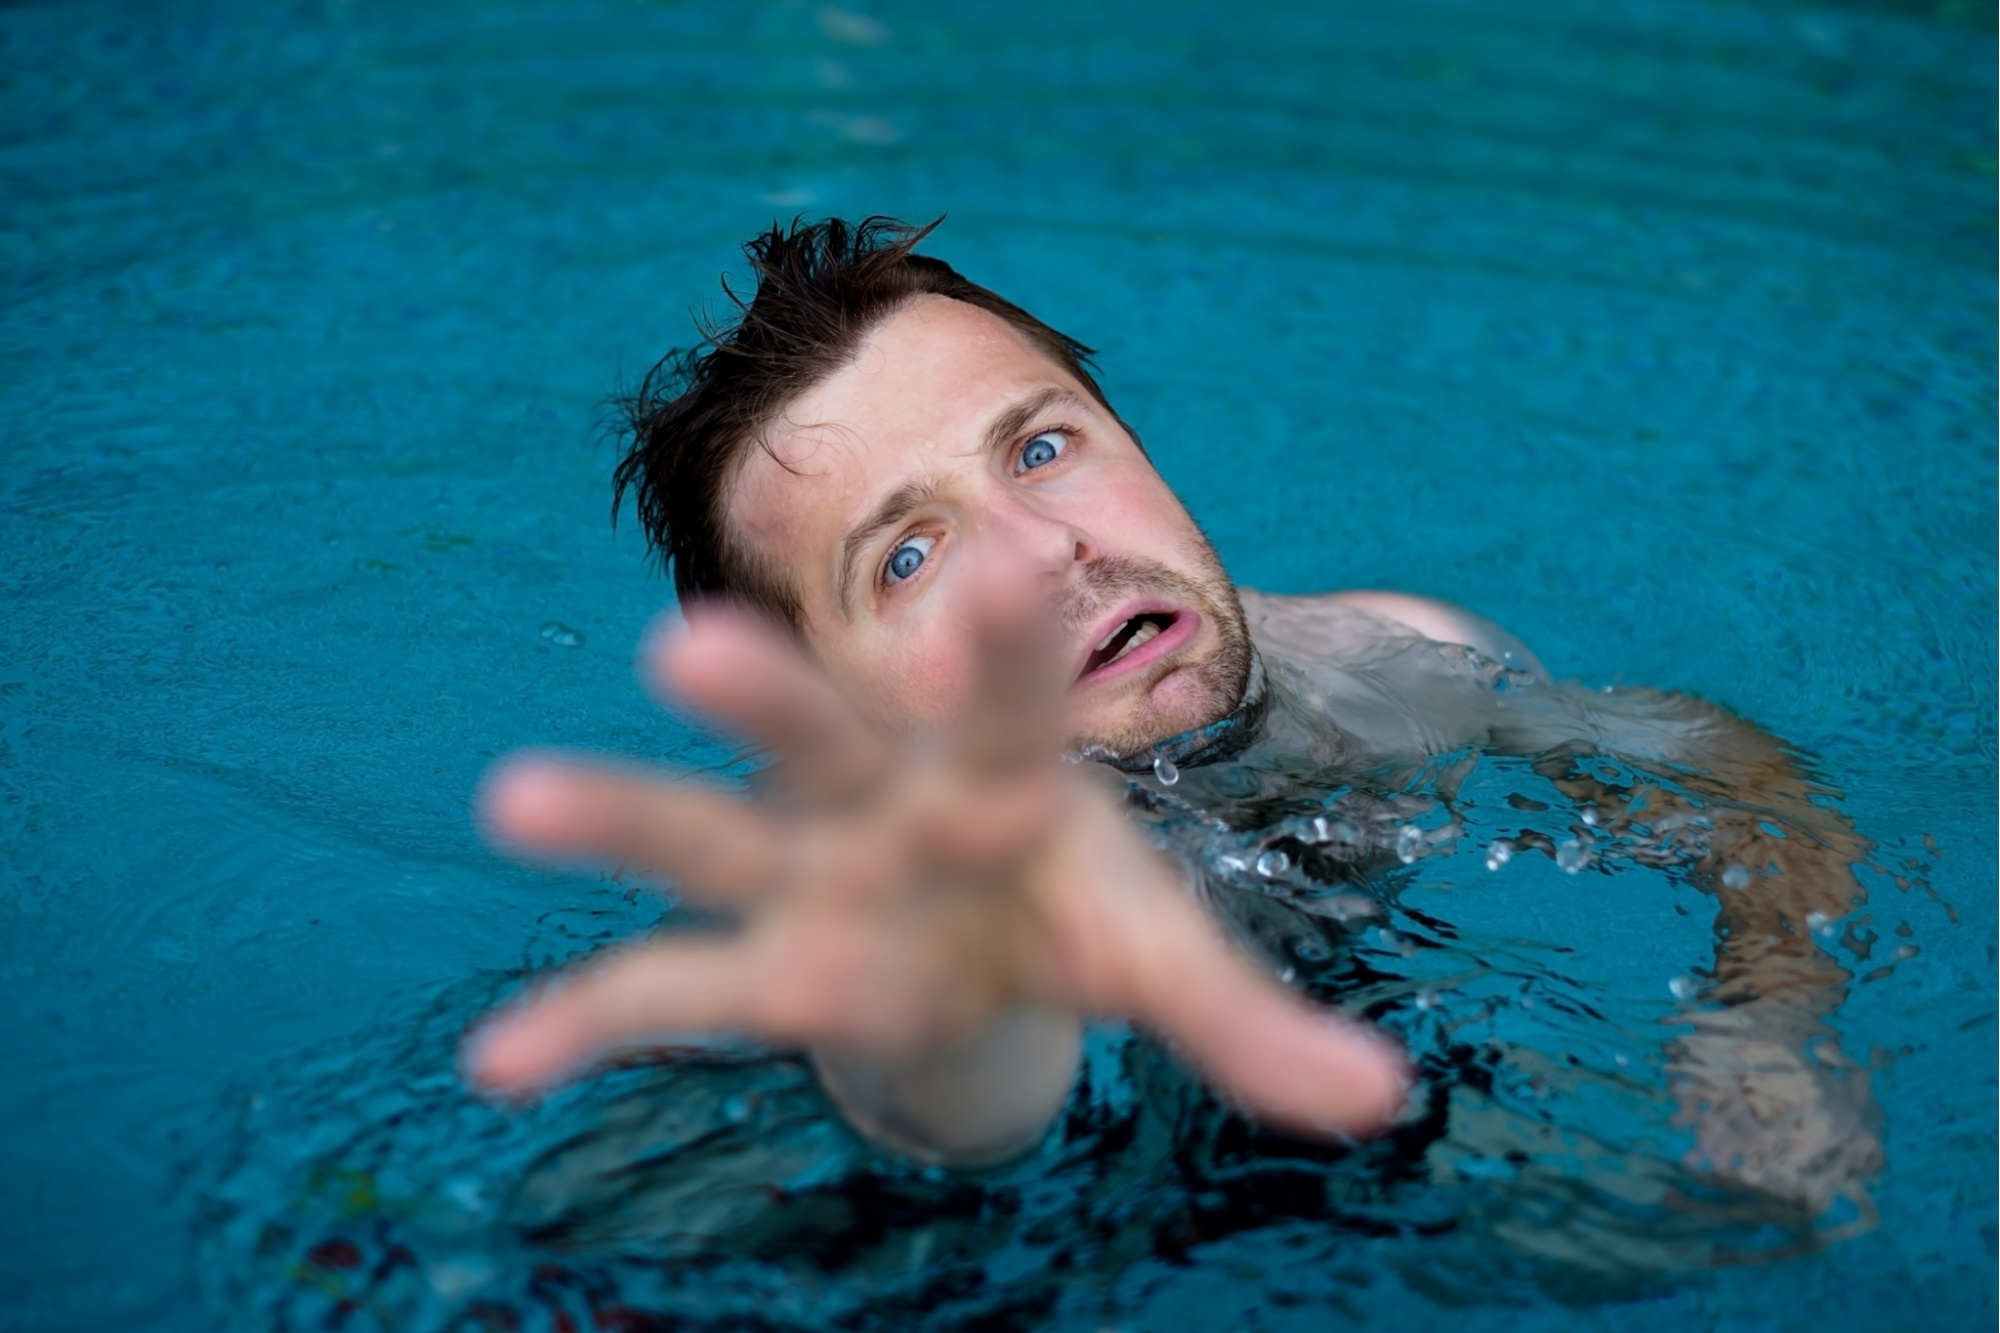 Drowning man desperately reaching for help.